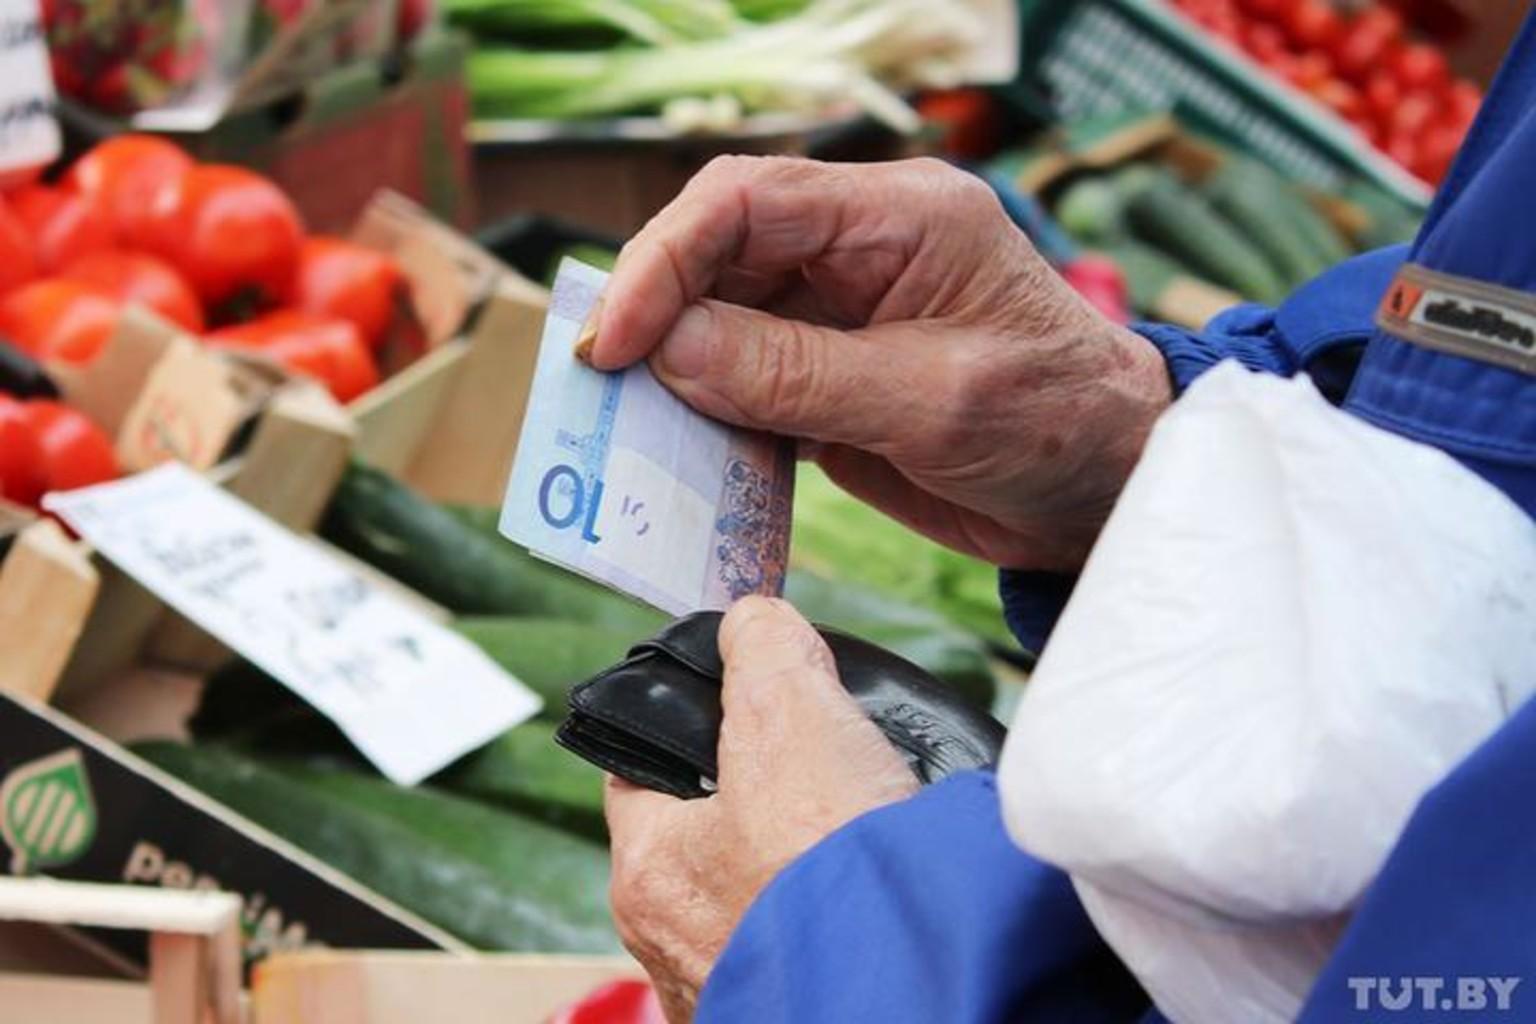 Komarovka pensiya pensionery dengi rubli